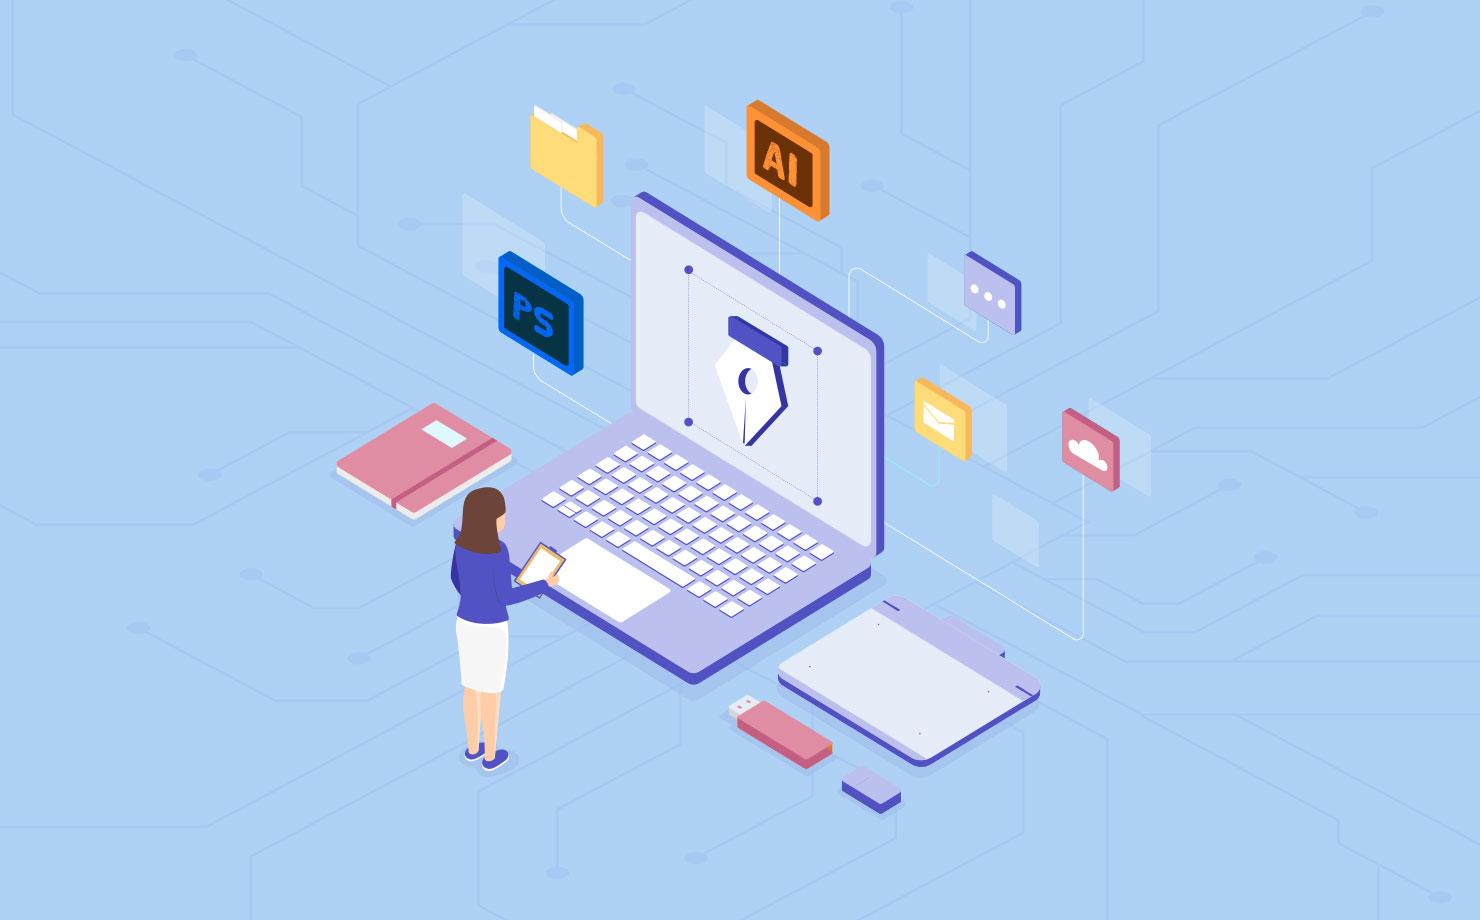 UI/UX design matters